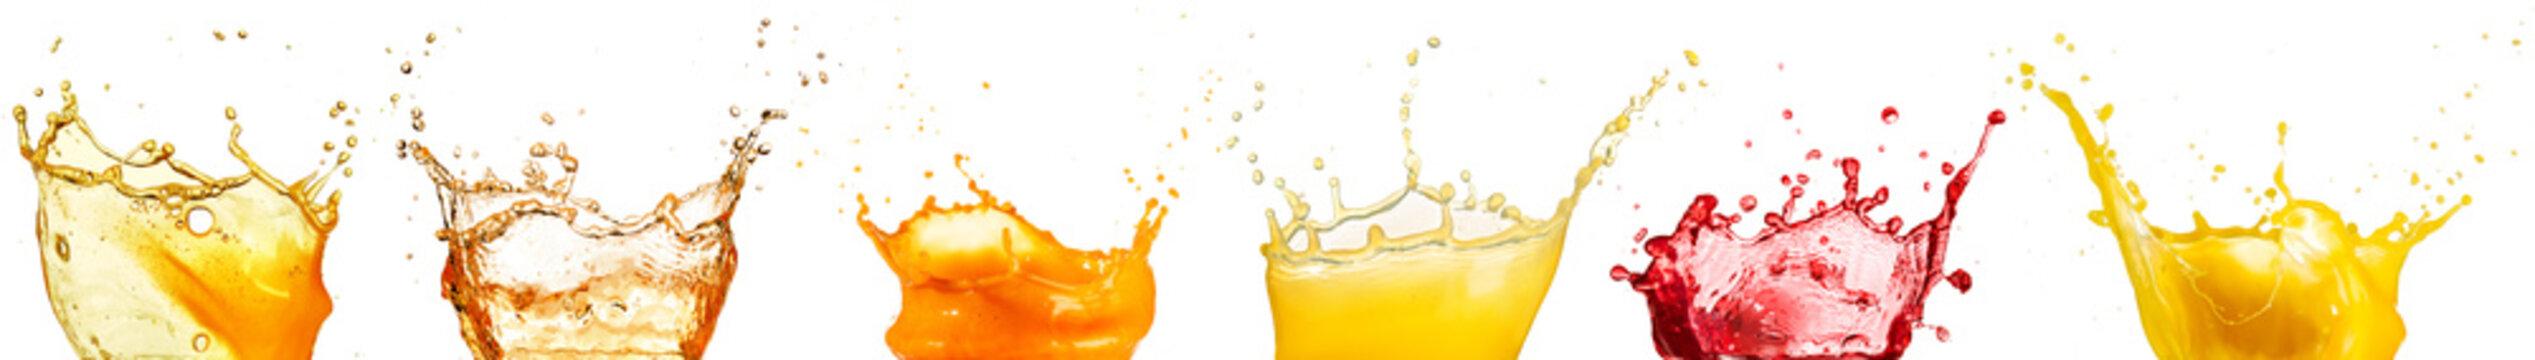 fruit juice splash collection isolated on white